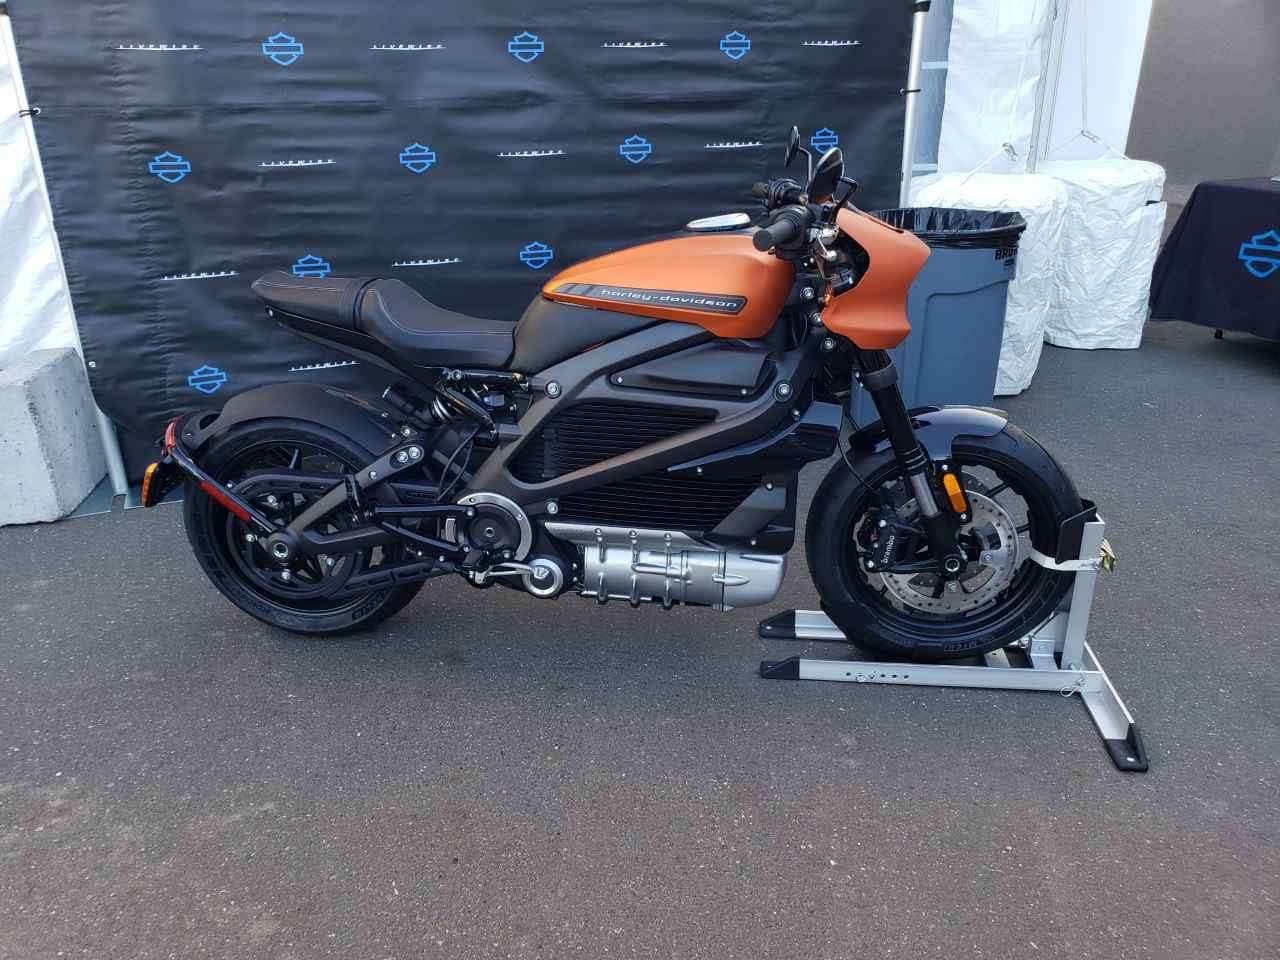 See the Men's Harley Riddick Boots Available at Las Vegas Harley-Davidson